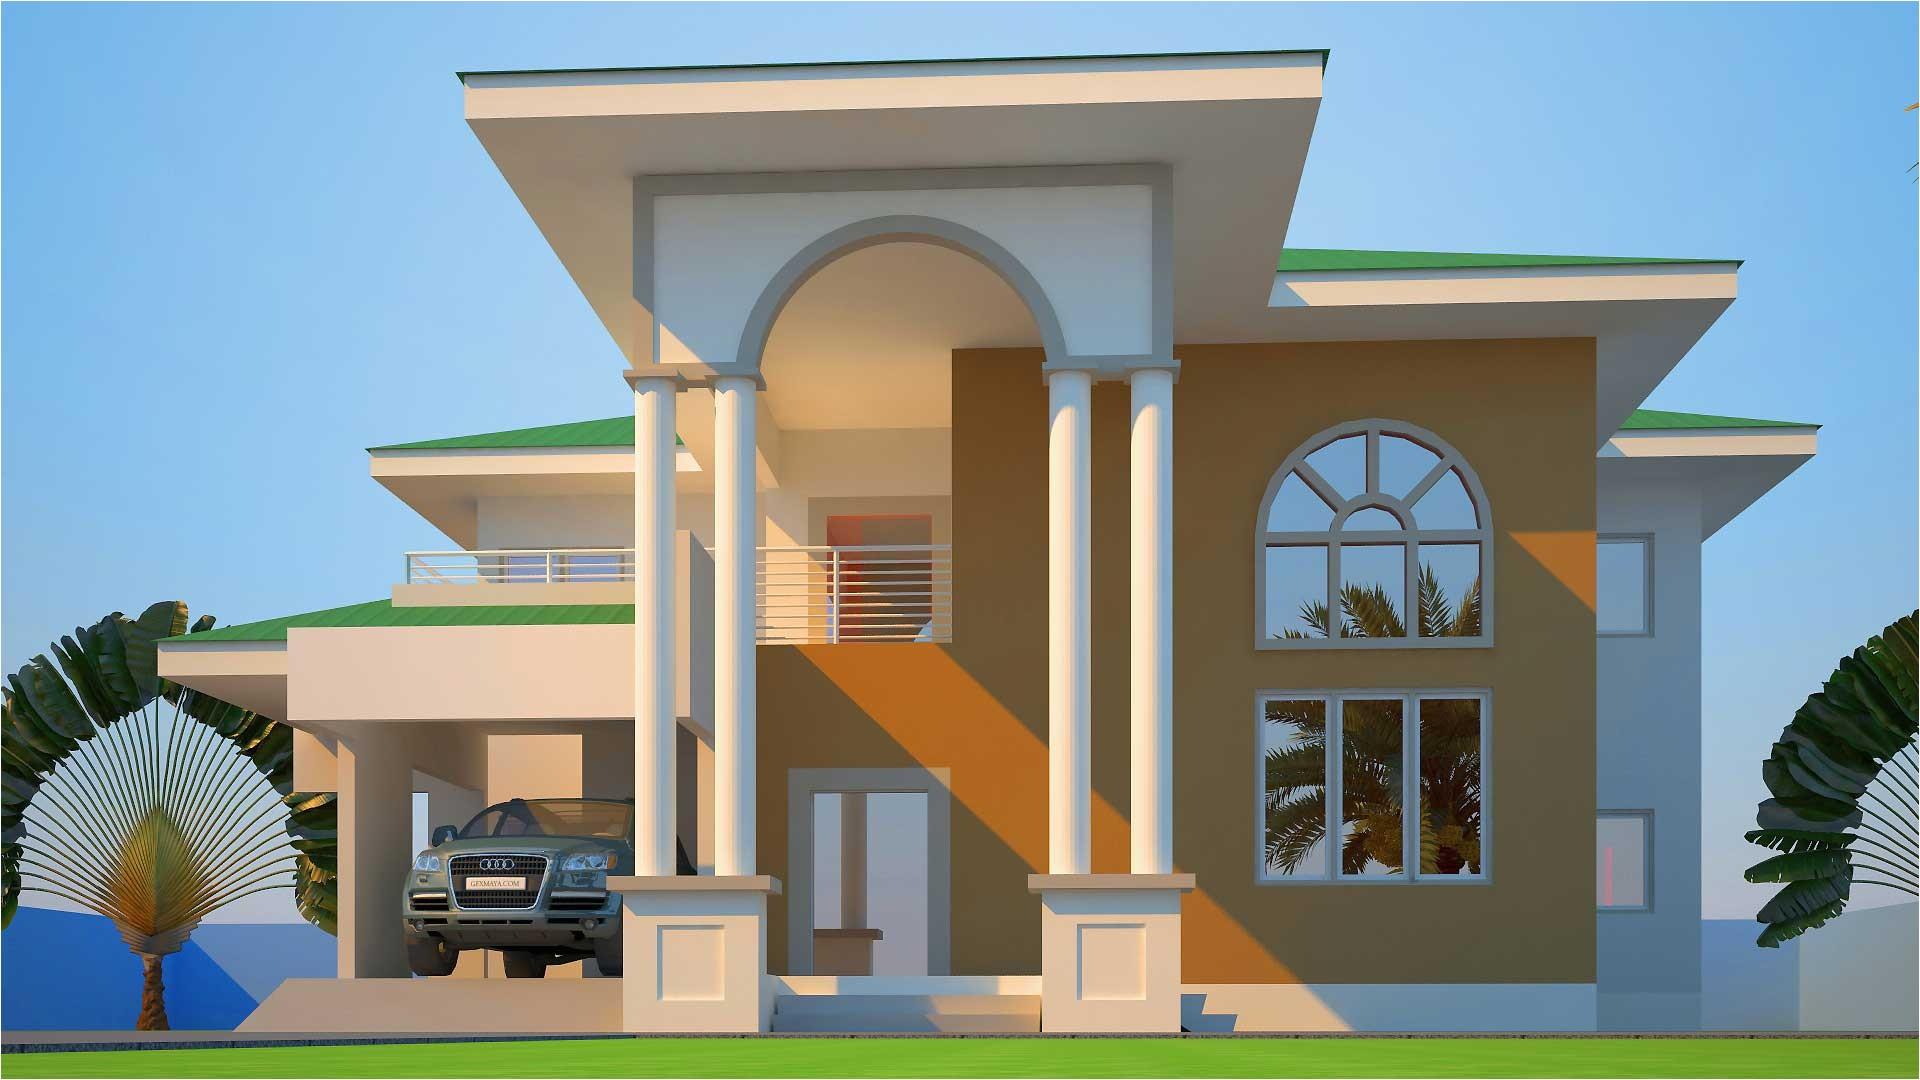 mabiba 5 bedroom house plan